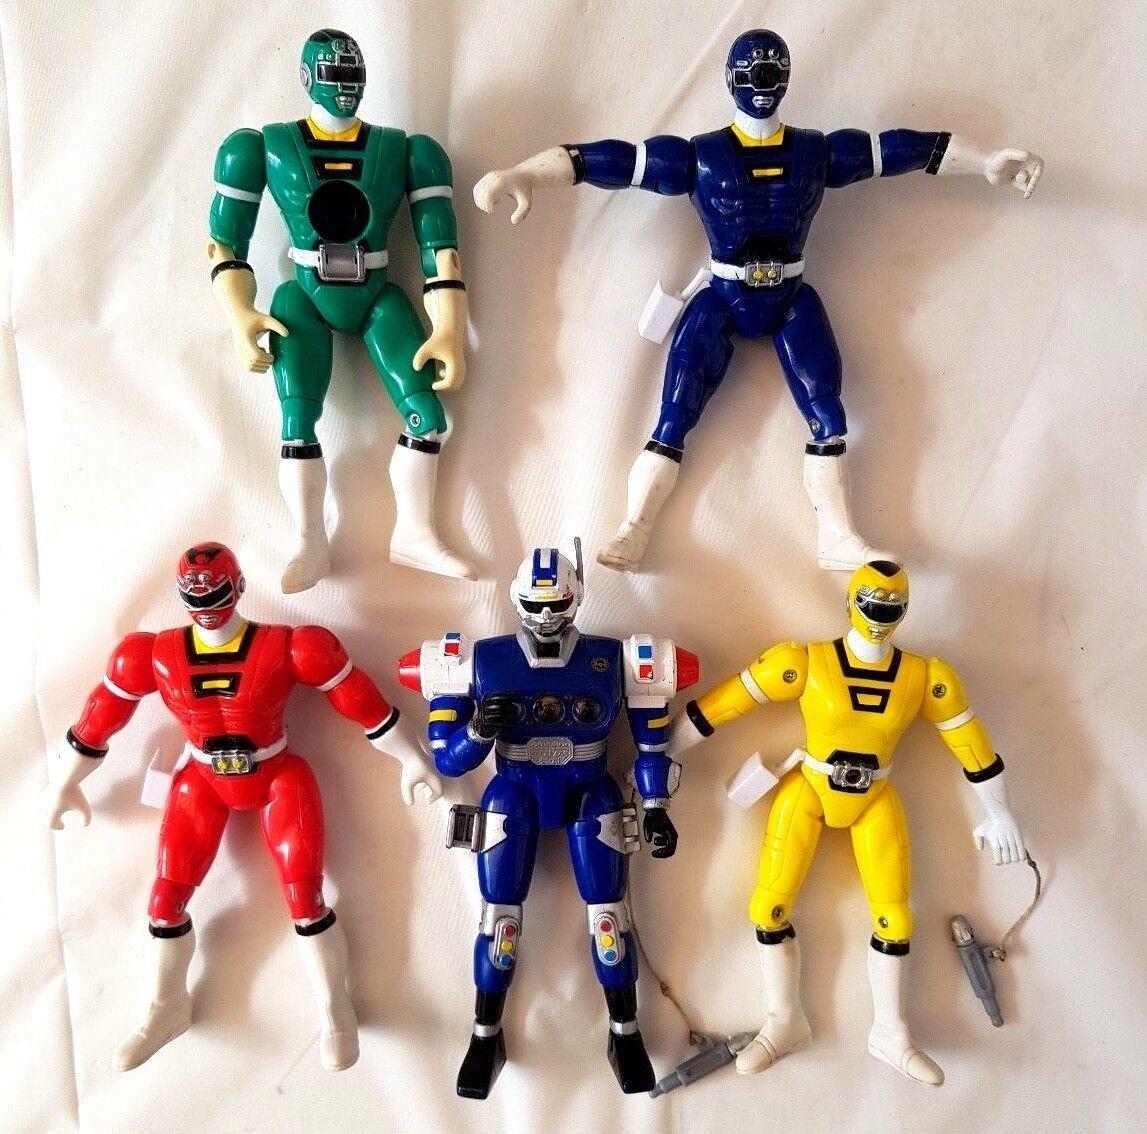 Turbo Power Rangers Bandai Action Figure Bundle 1997